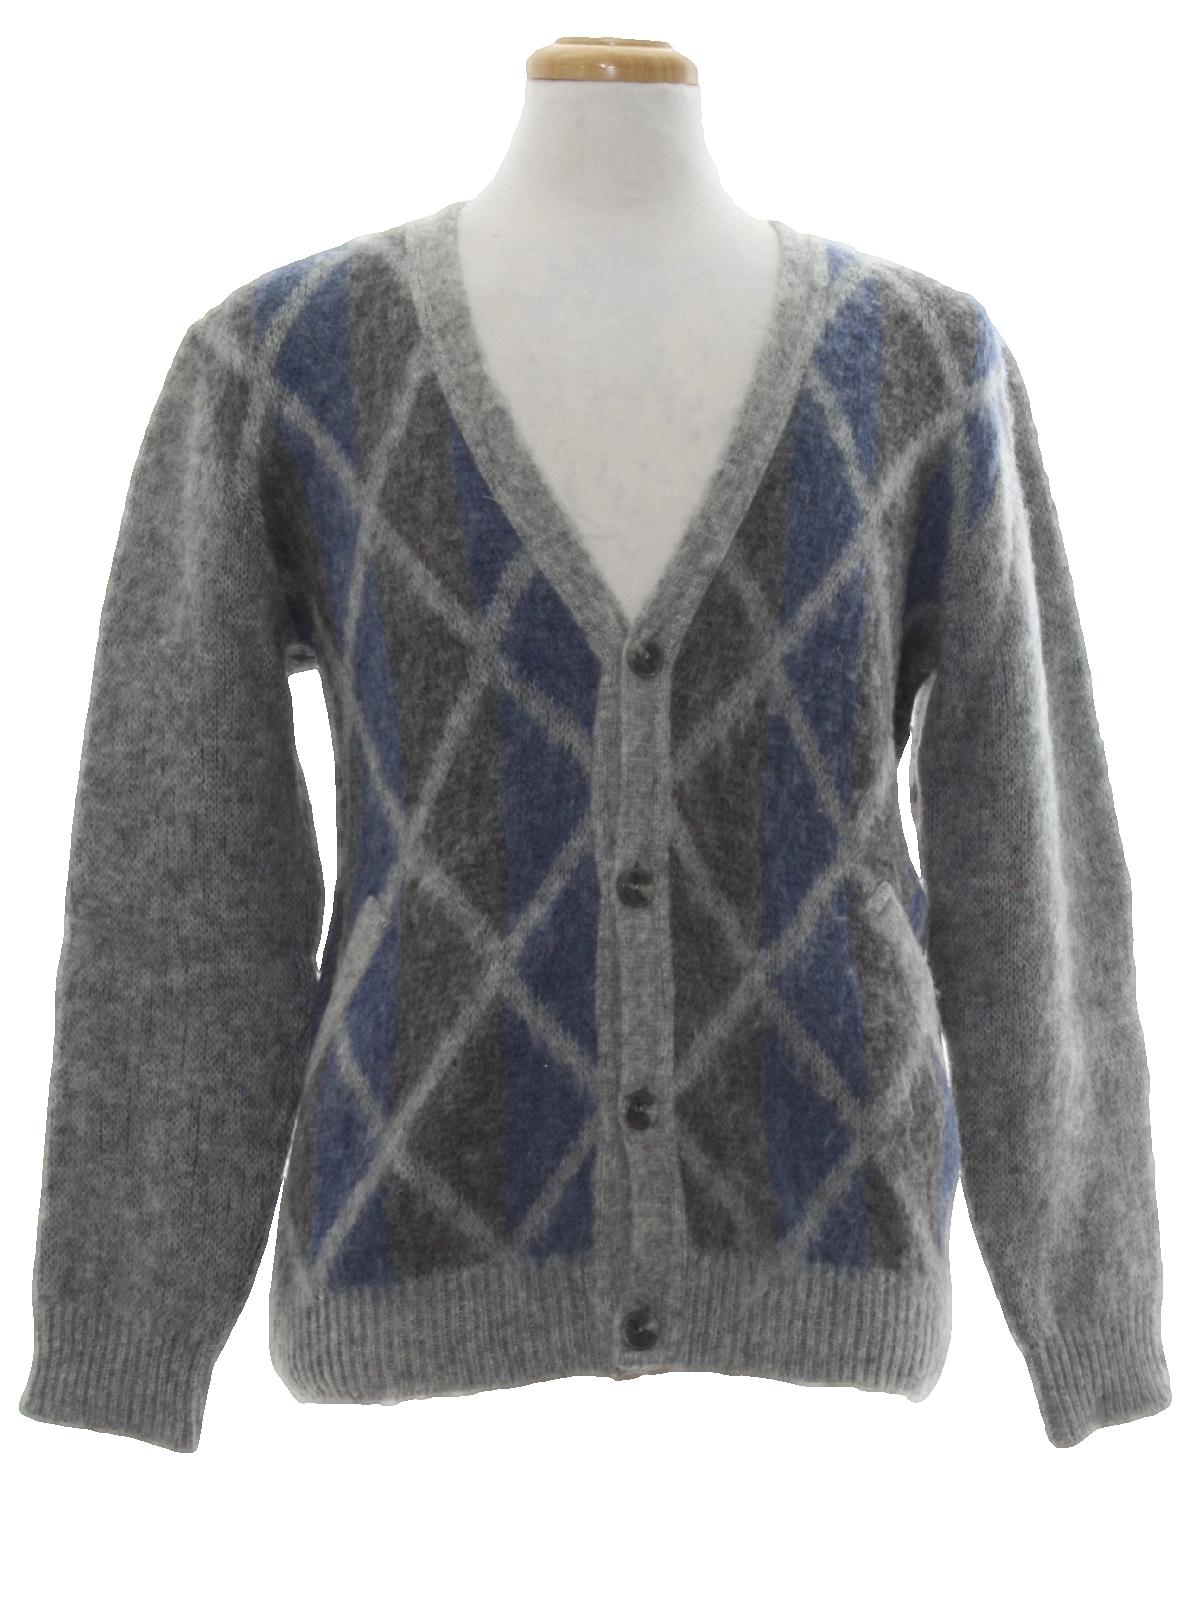 Icewear Eighties Vintage Caridgan Sweater: 80s -Icewear- Mens ...